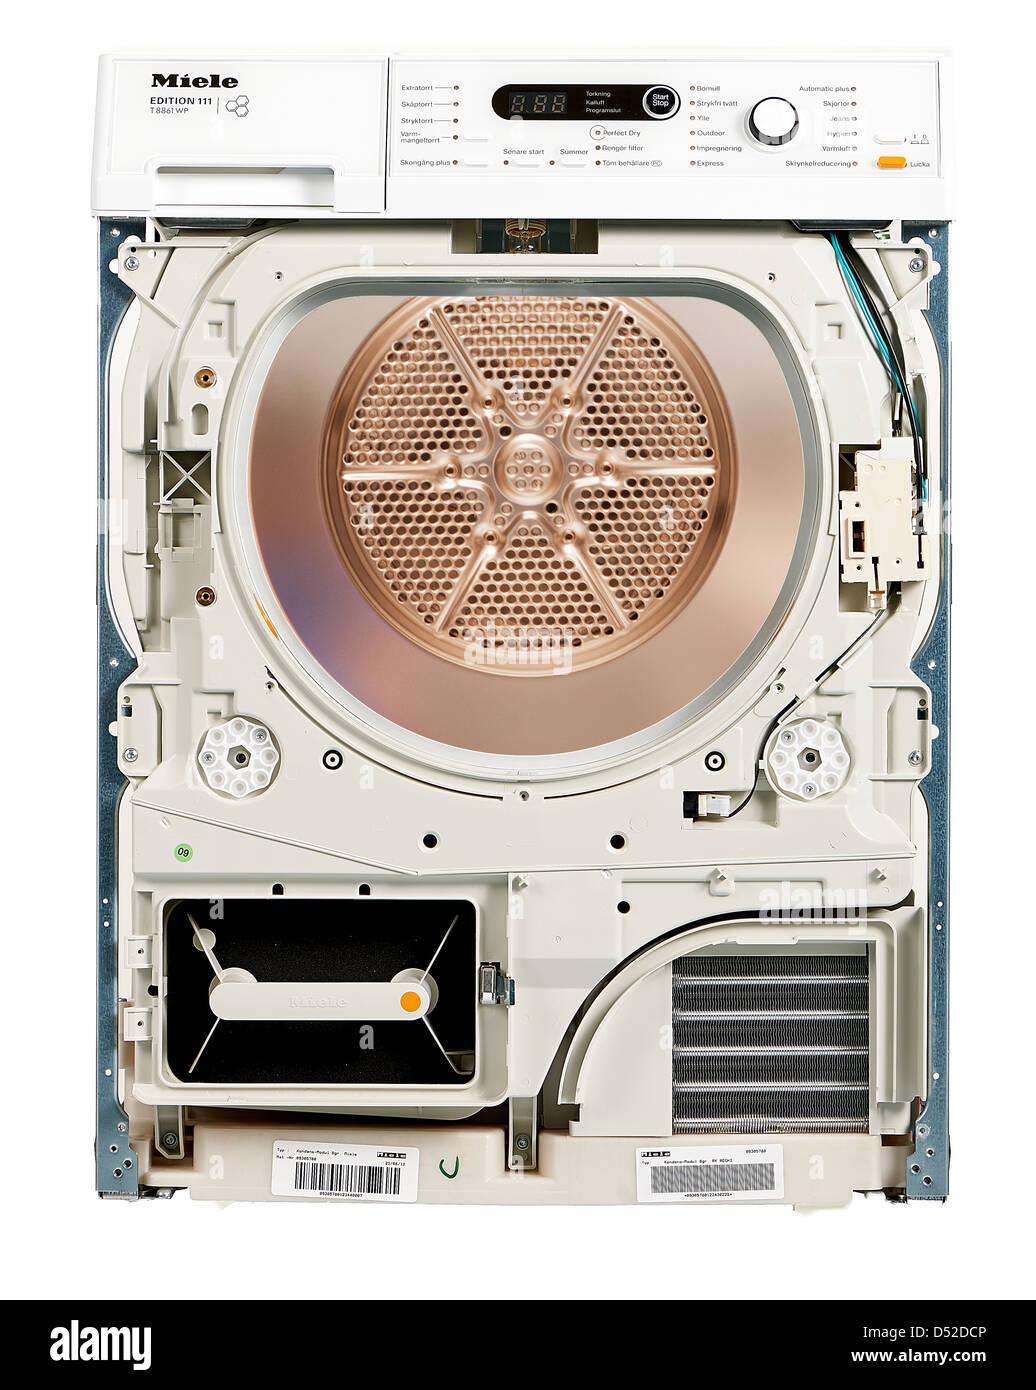 Miele Washing Machine Stock Photos Wiring Diagram Mashine Image